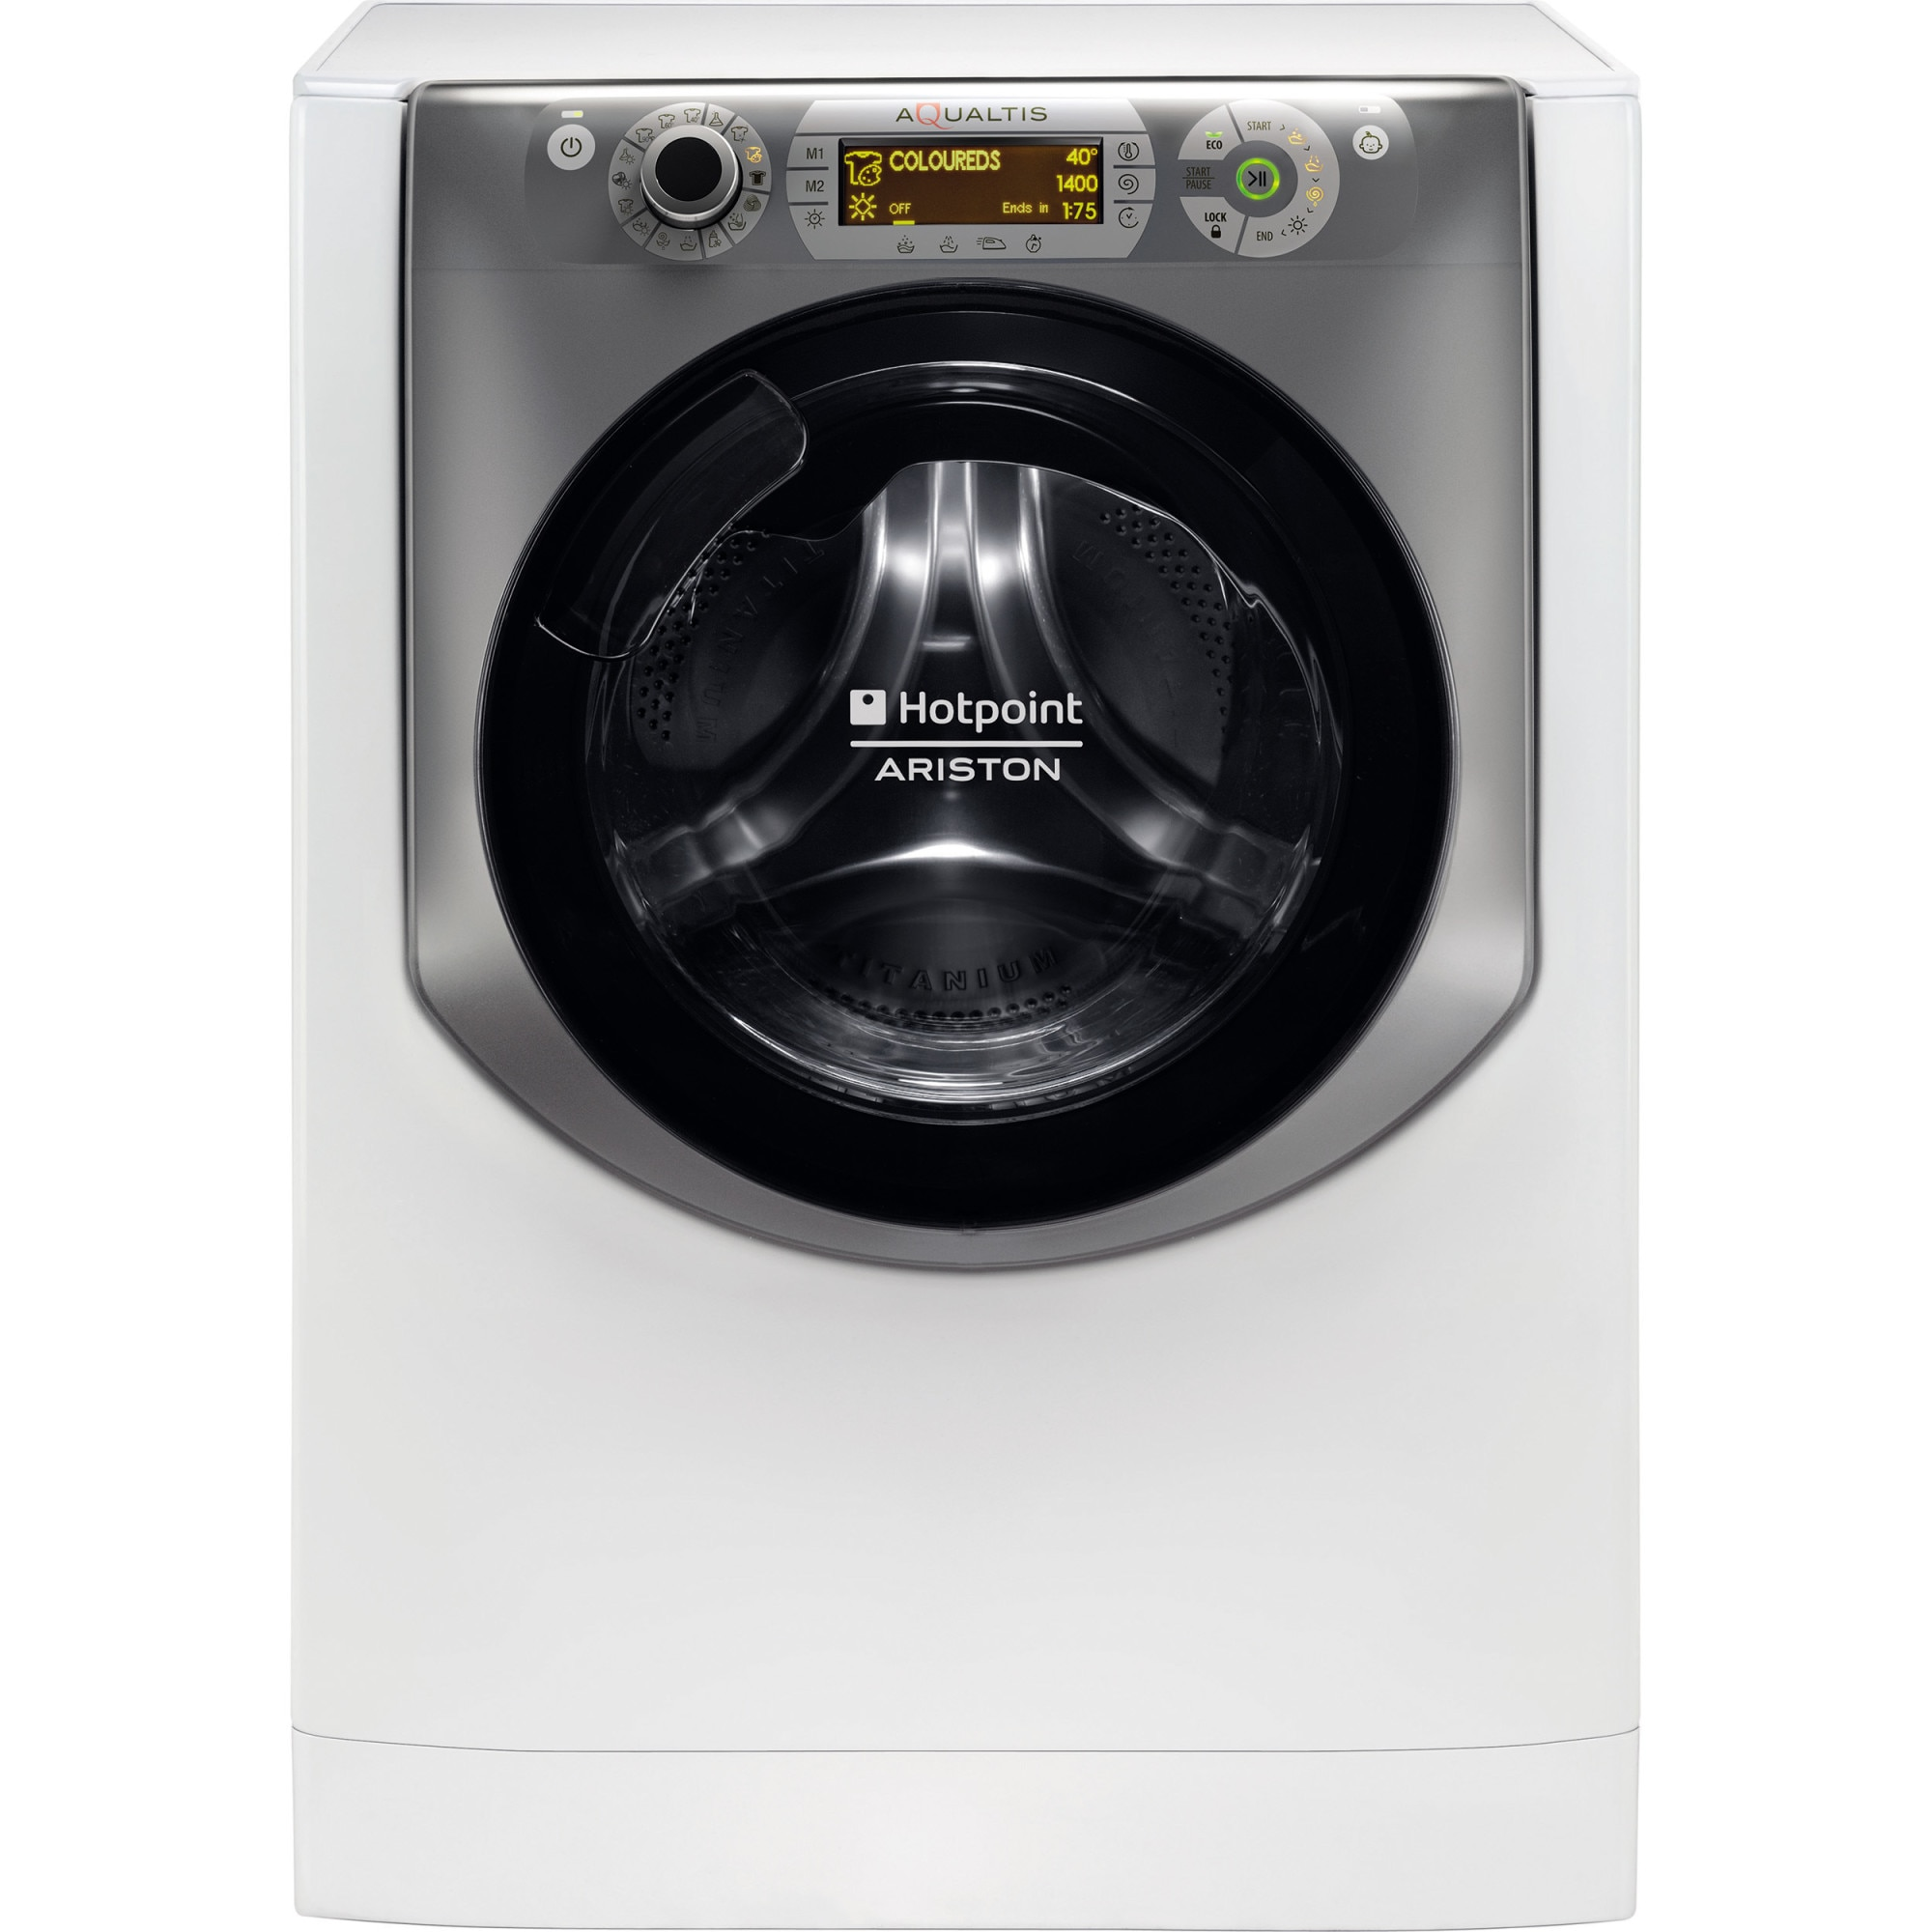 Fotografie Masina de spalat rufe cu uscator Hotpoint AQD970D49, 1400 RPM, Spalare 9 kg, Uscare 7 kg, Clasa A, Motor Inverter, Display LCD, Alb